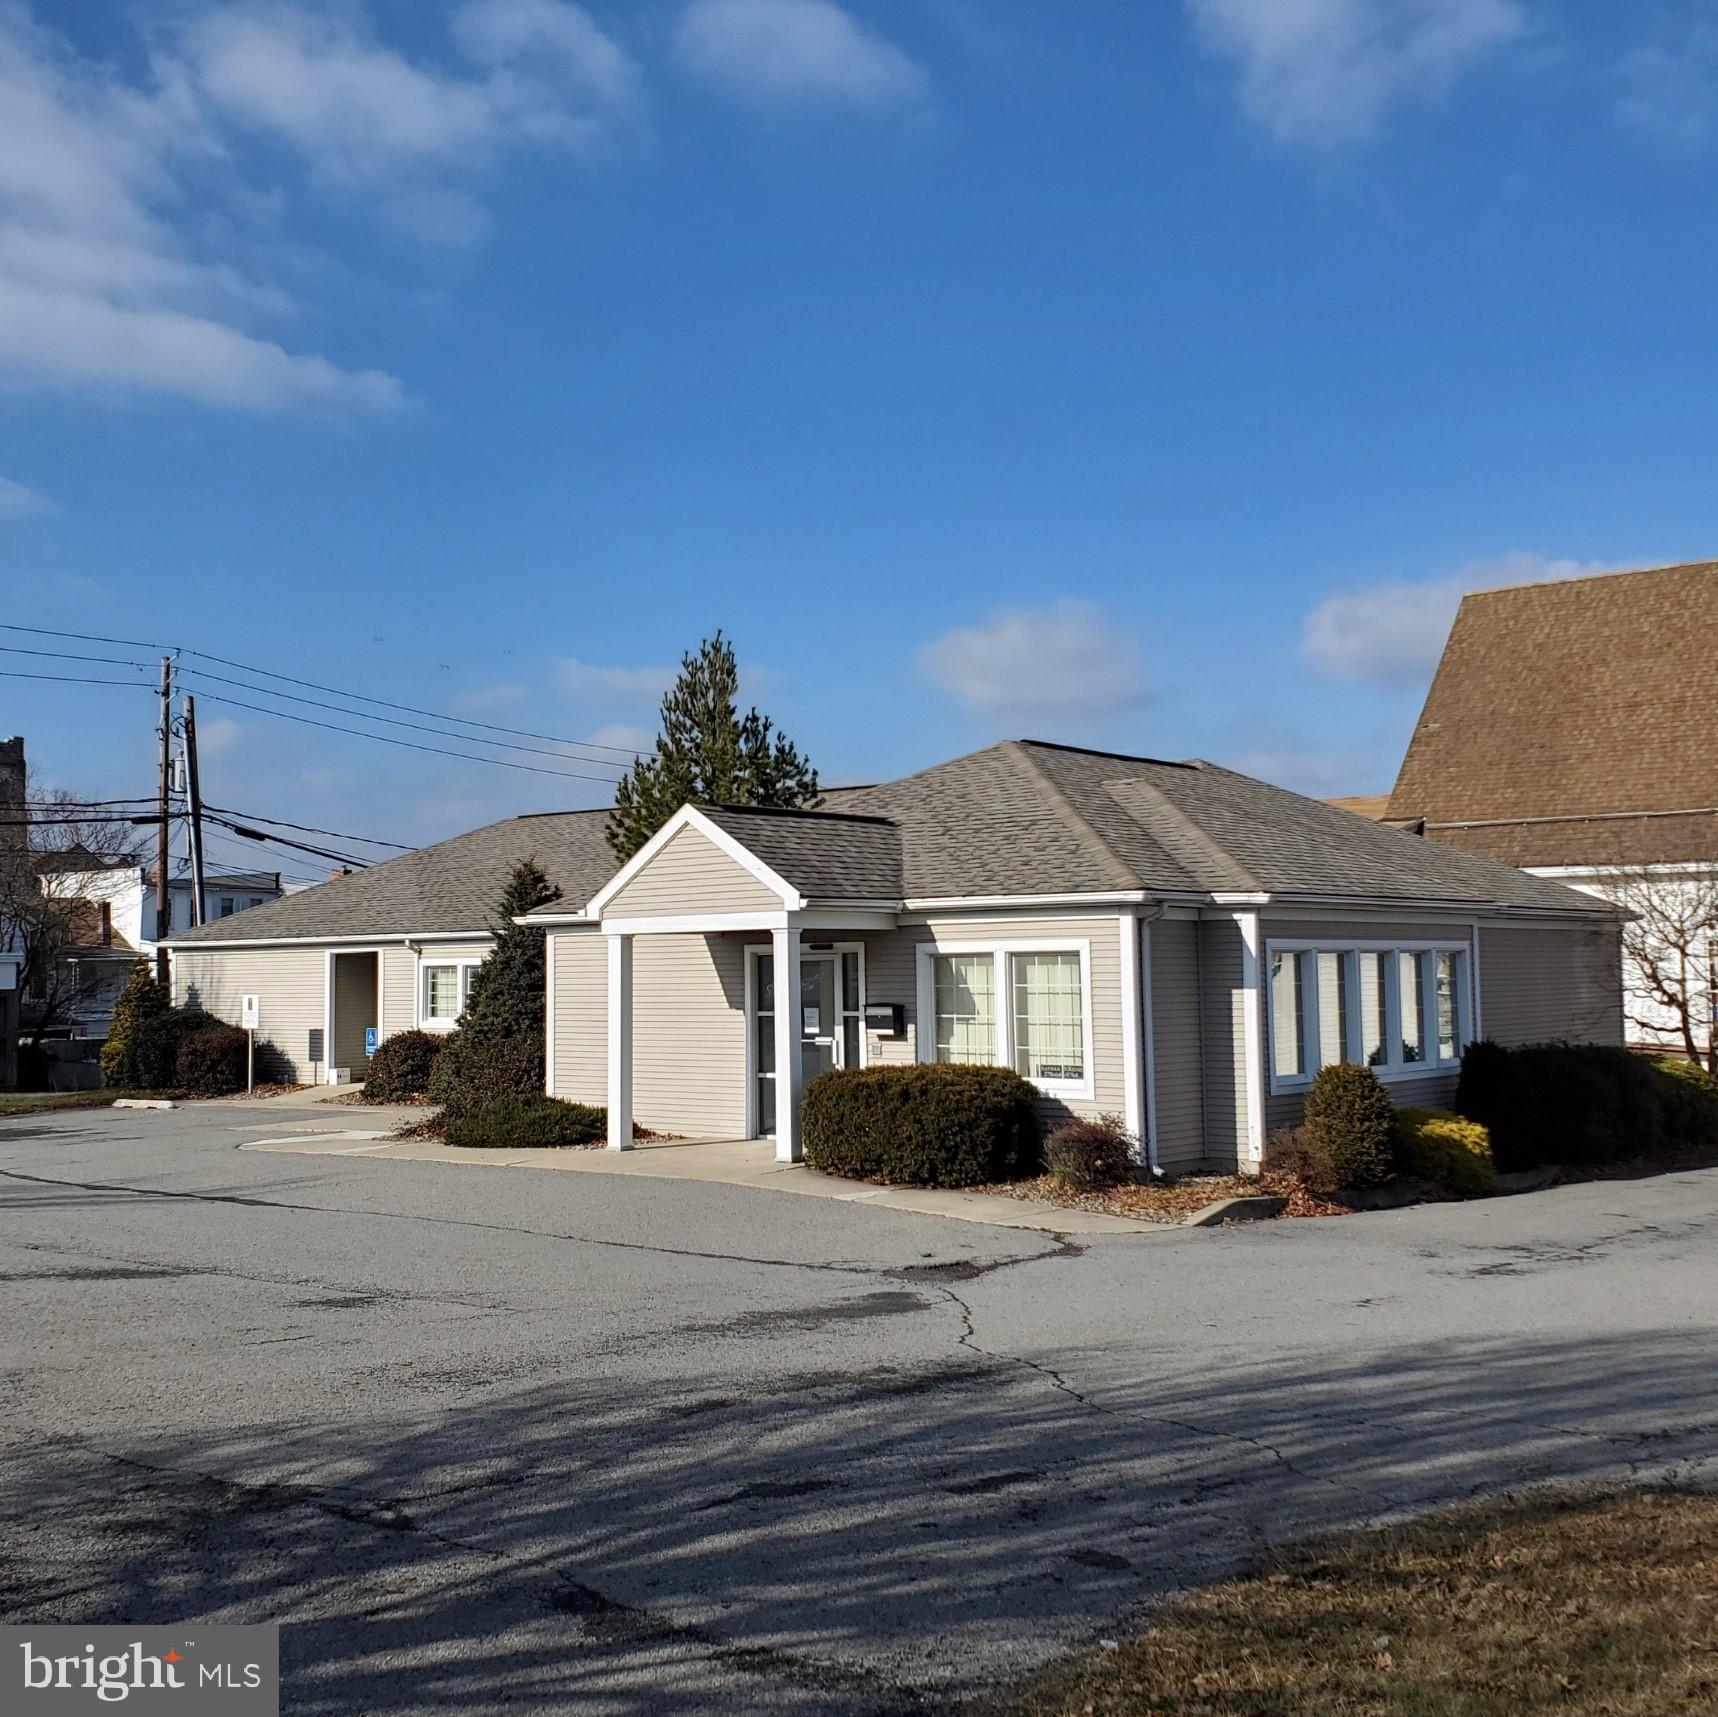 135 E 3RD STREET, MOUNT CARMEL, PA 17851